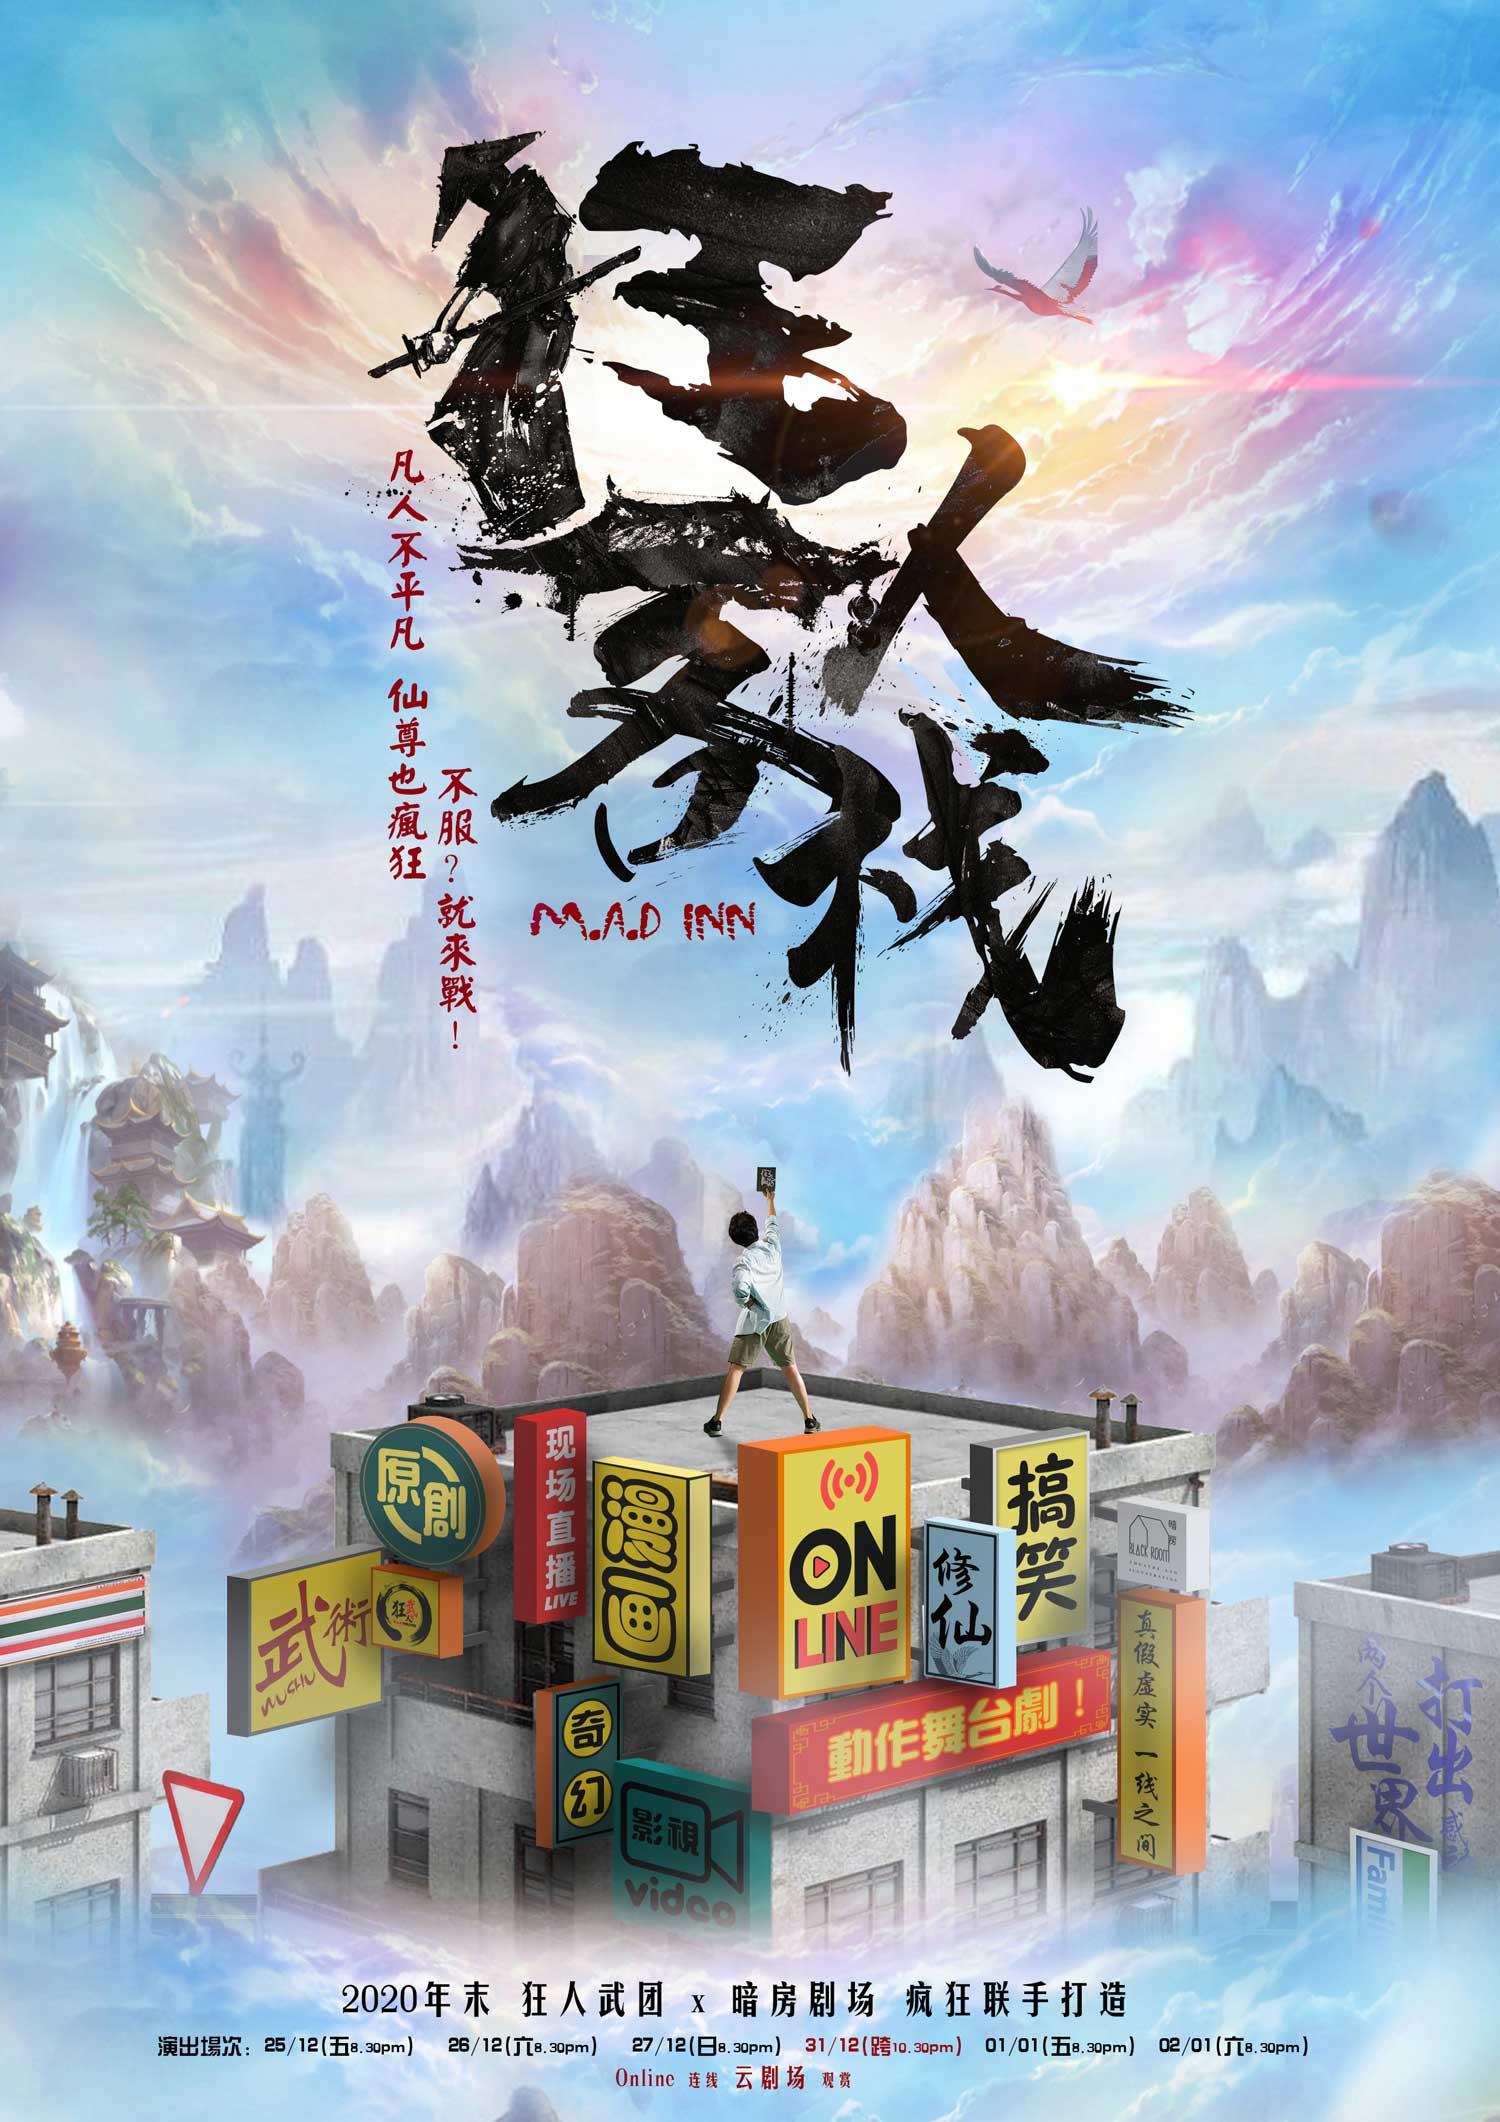 ON-LIN(V)E修仙 · 搞笑动作舞台剧 《狂人客栈M.A.D INN》